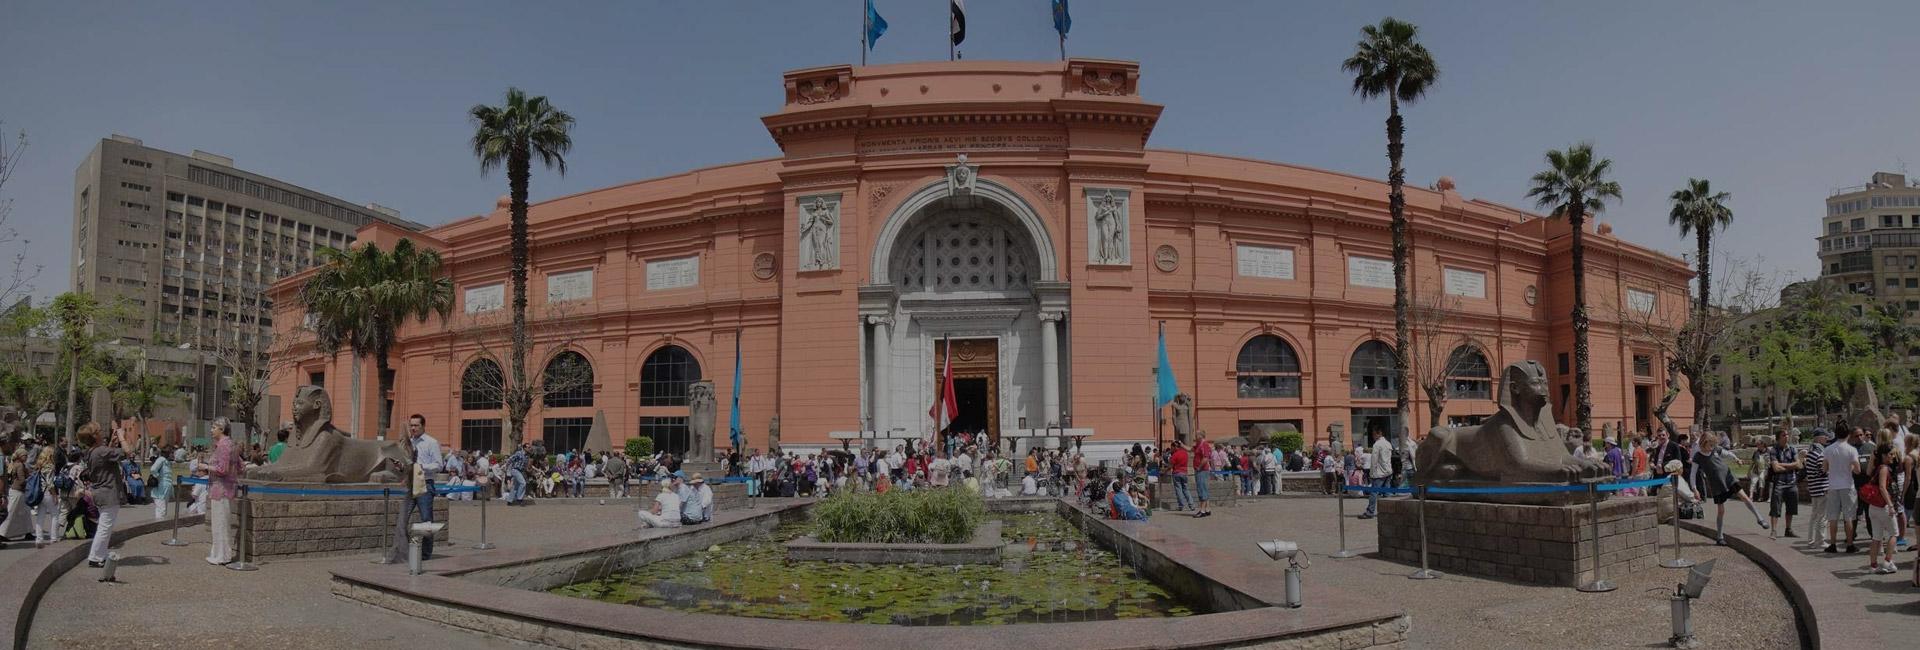 Cairo to Abu Simbel and Luxor overland tour